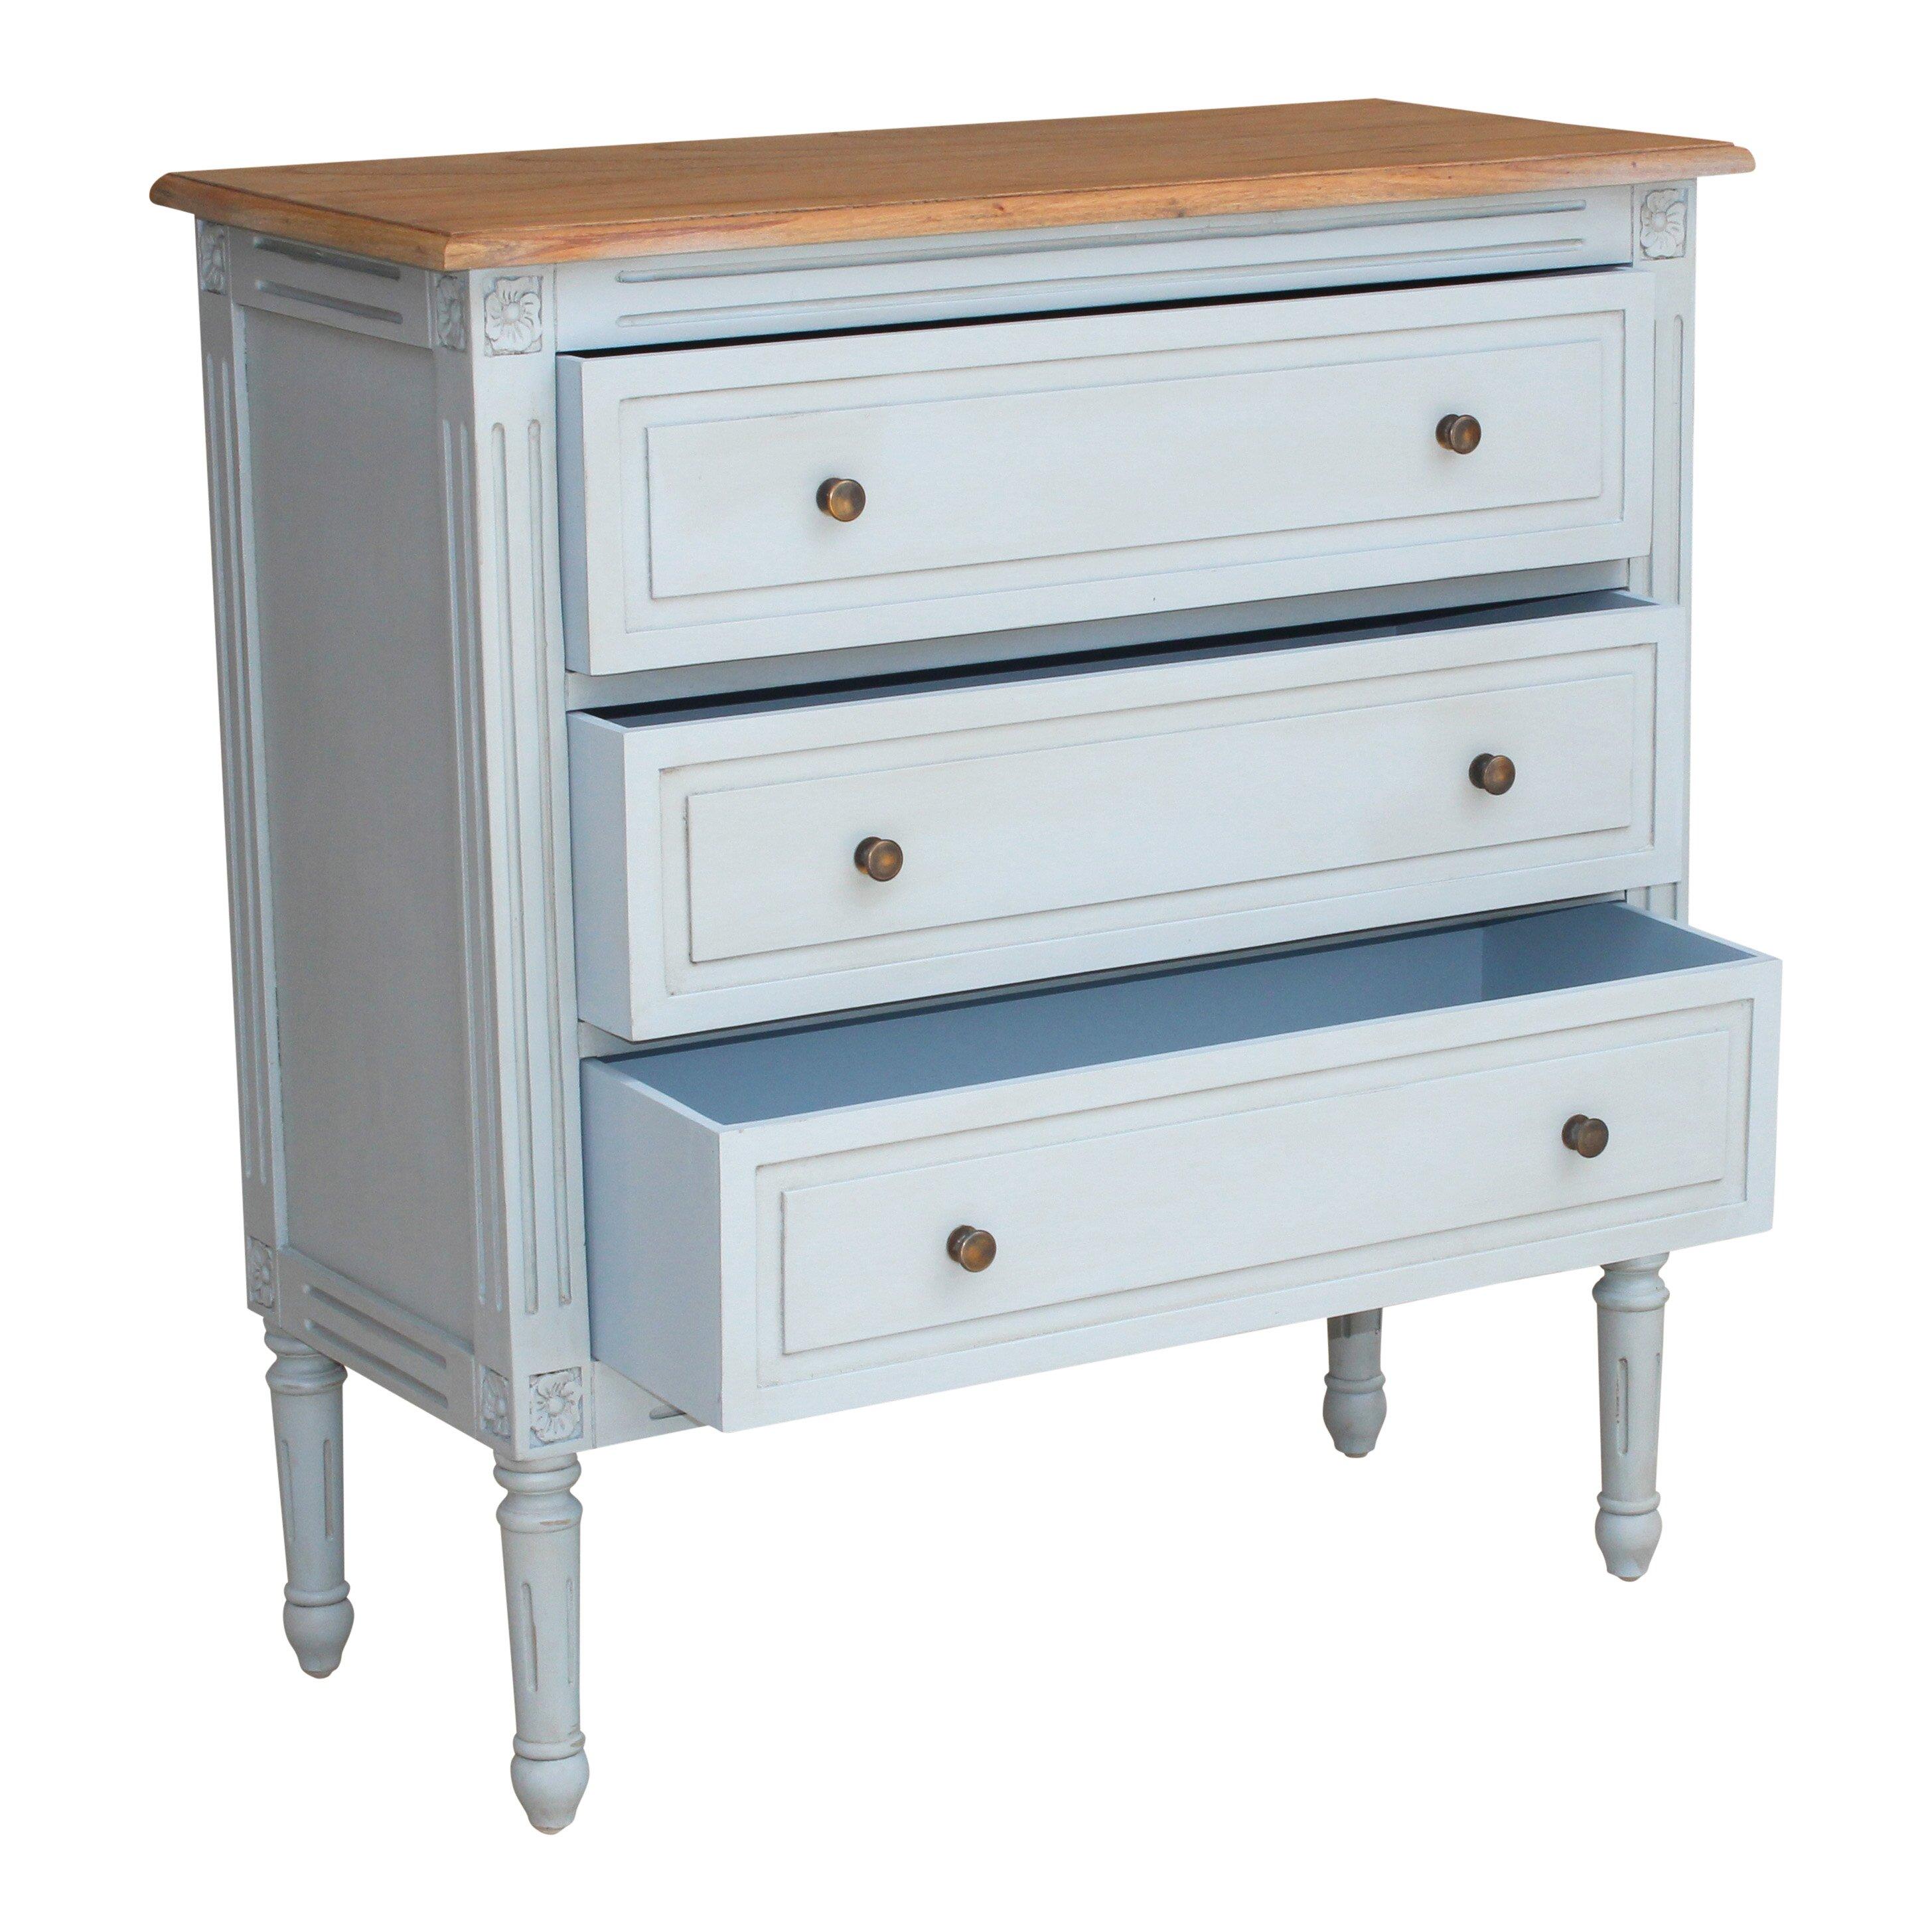 Maine Furniture Co Hope 3 Drawer Chest Wayfair Uk